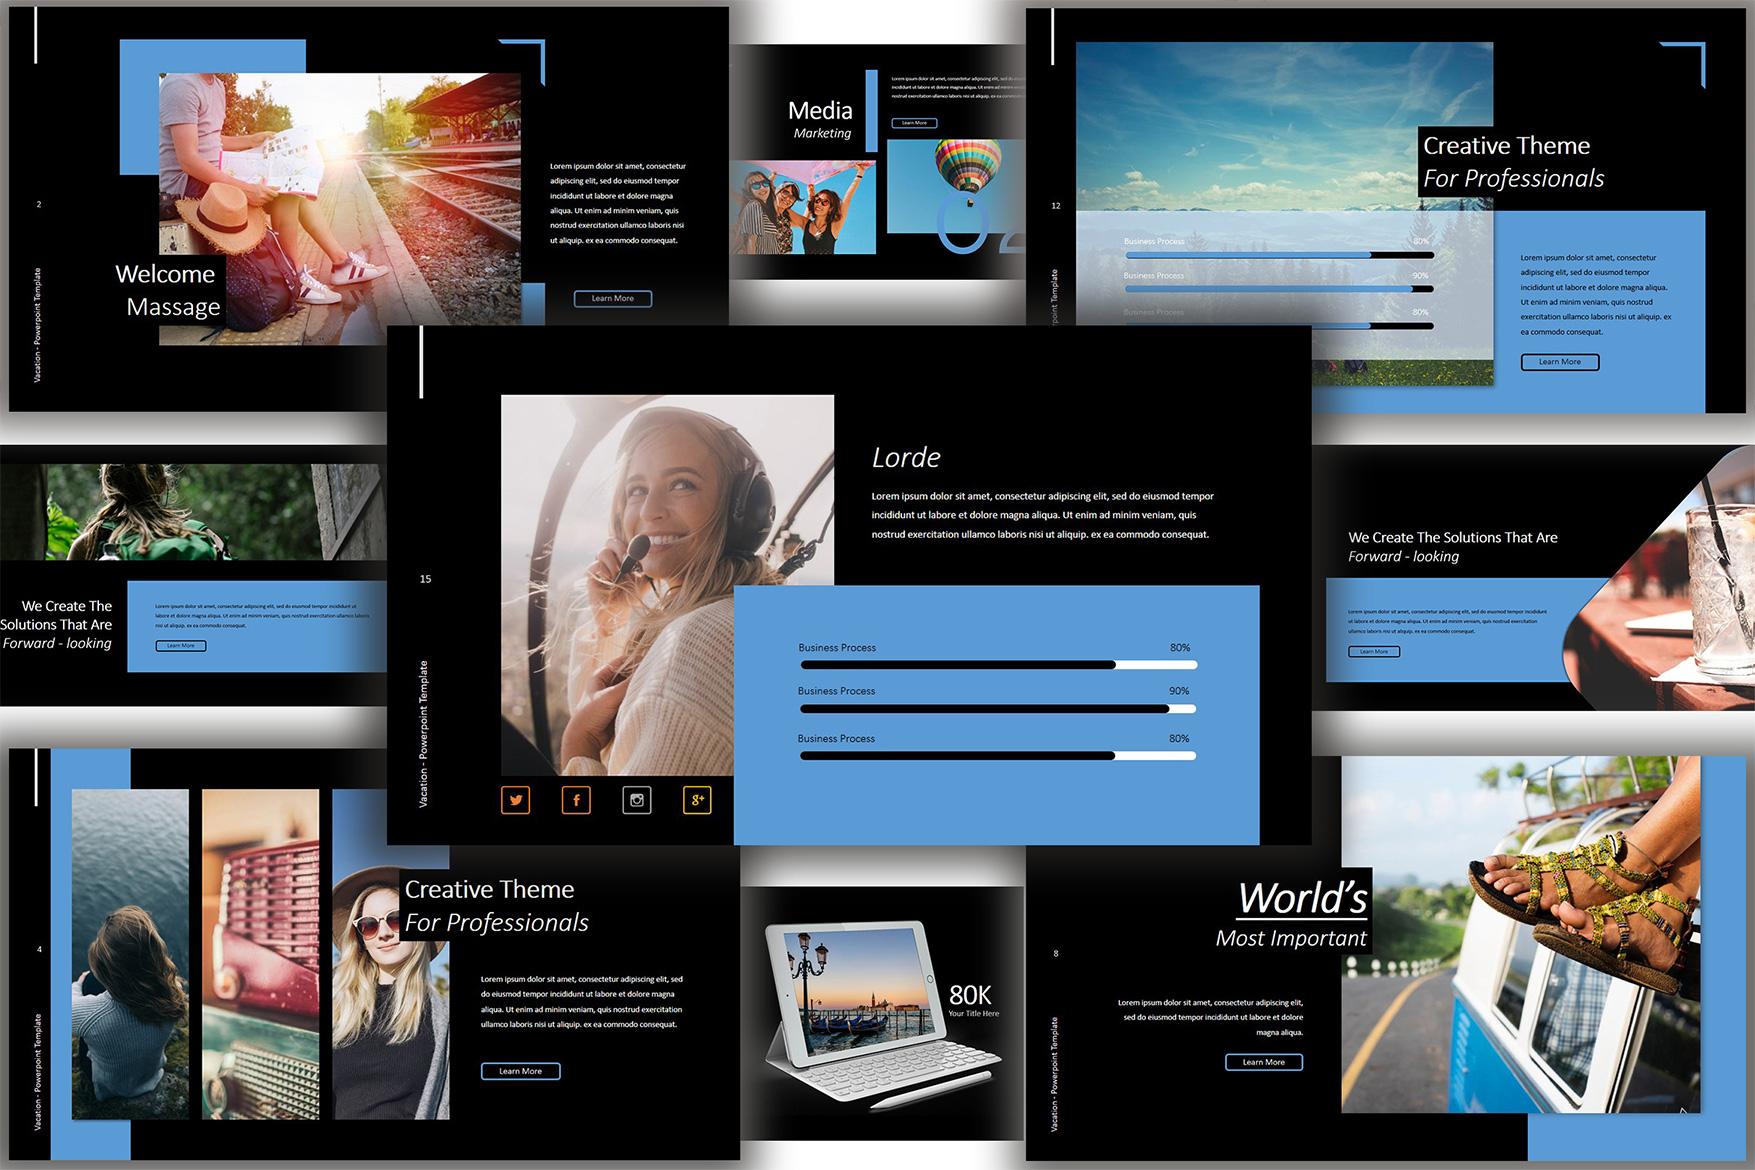 Vacation Lookbook Dark Powerpoint Template example image 5